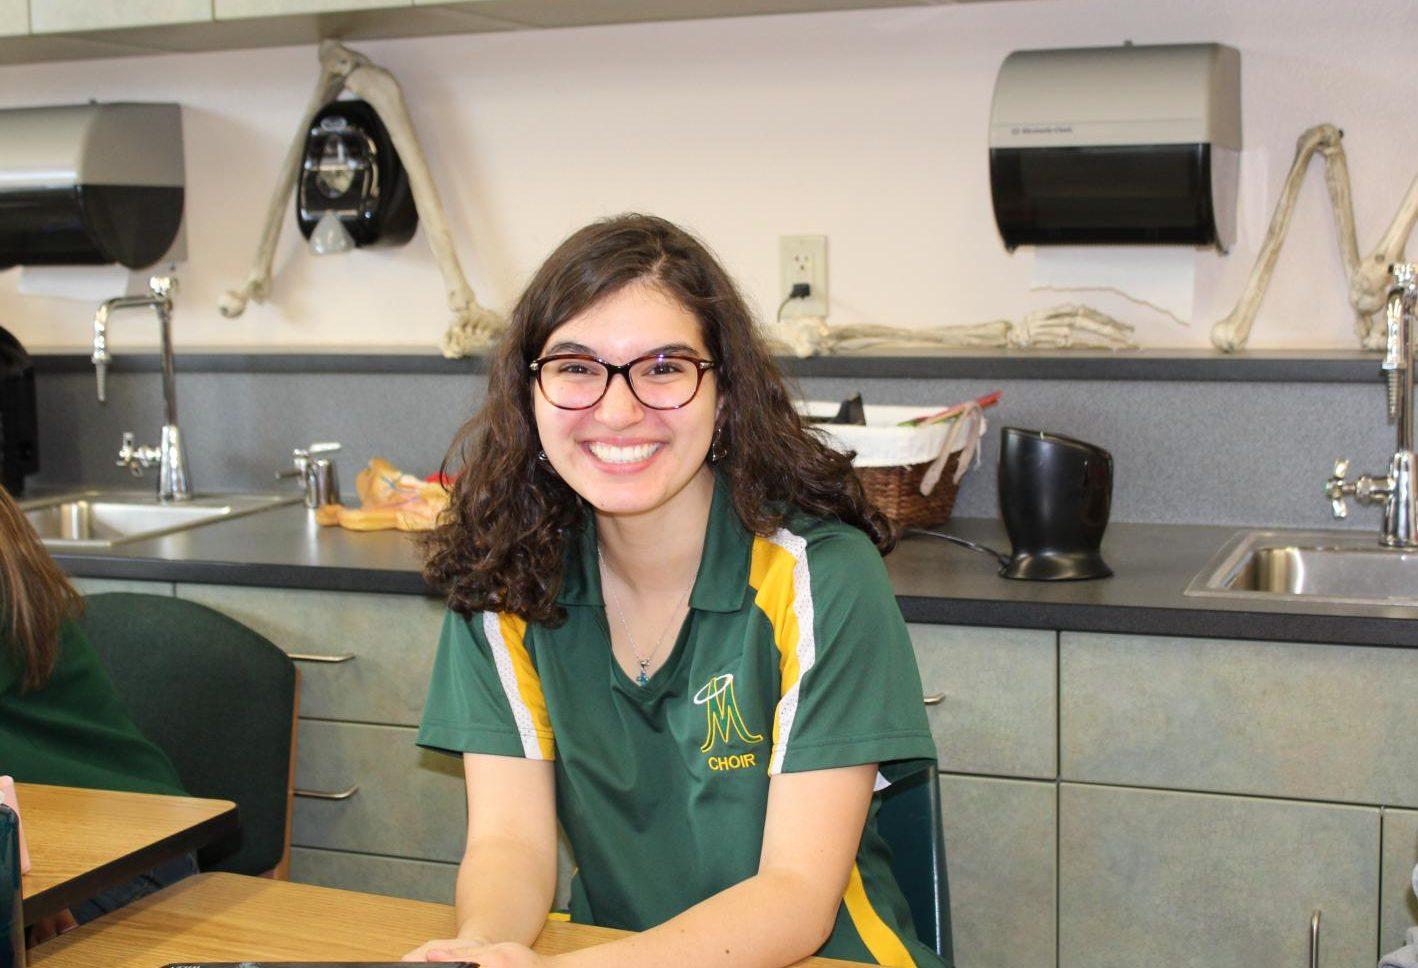 Gillian Trujillo (Photo courtesy of Mrs. Myrehn)